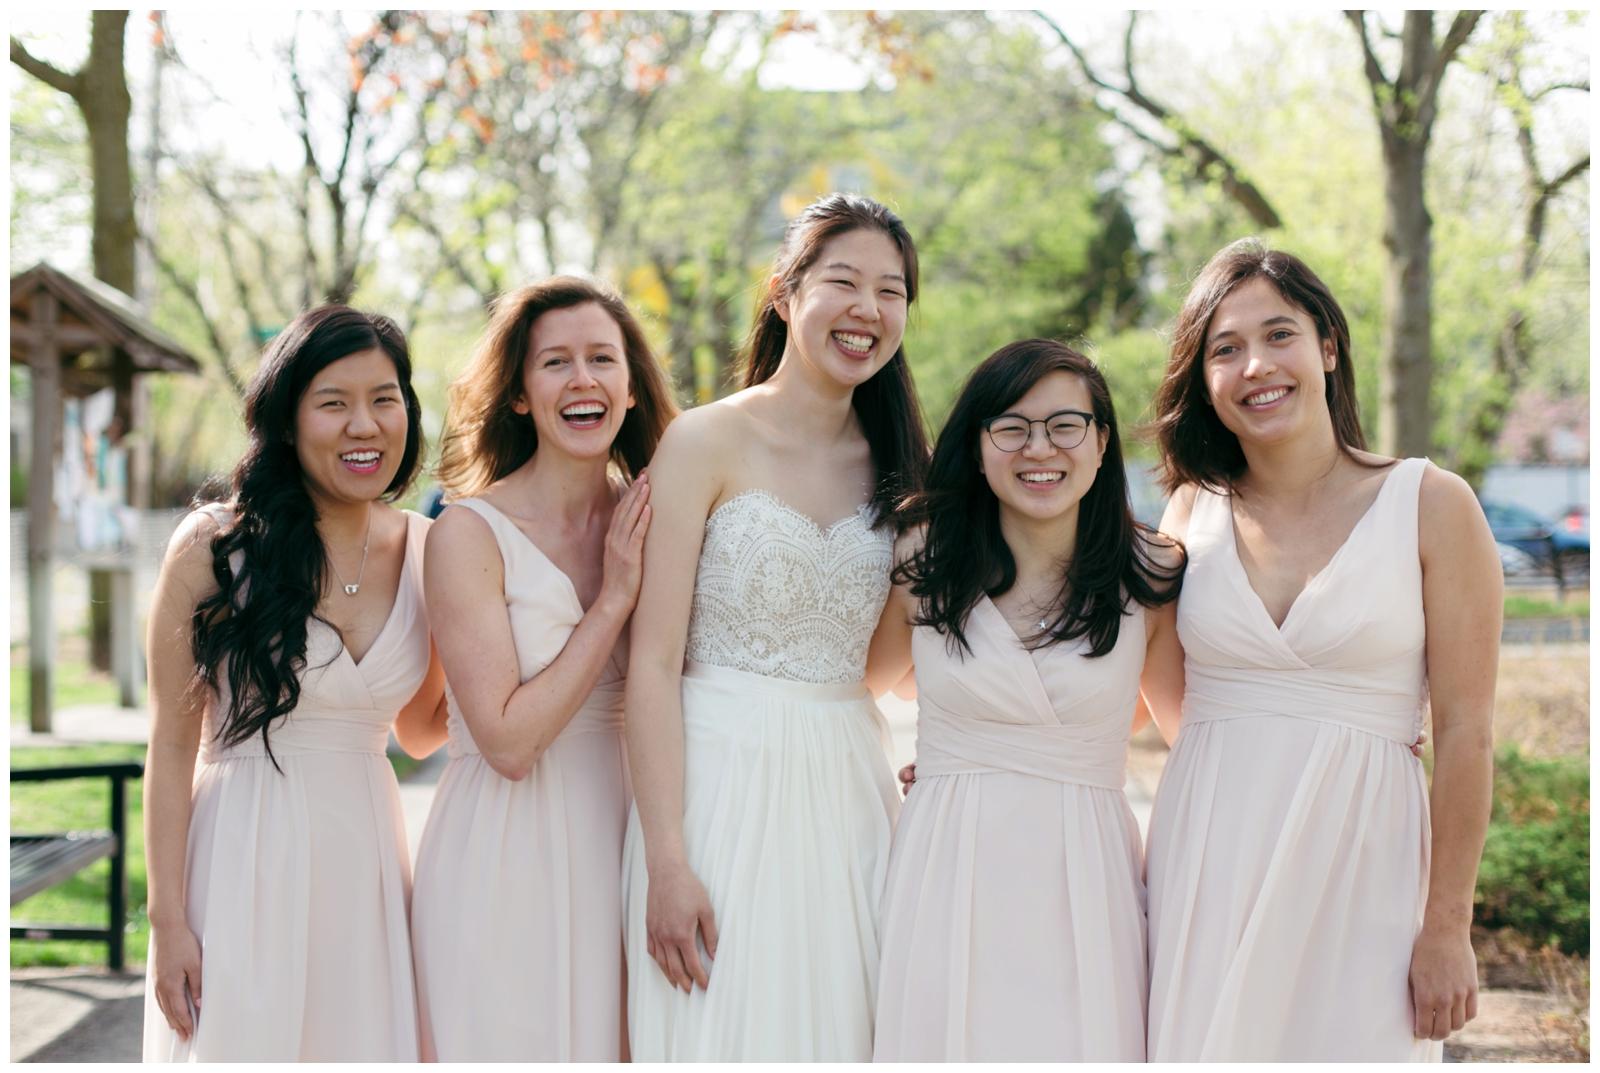 Samberg-Conference-Center-Boston-Wedding-Photographer-Bailey-Q-Photo-017.jpg